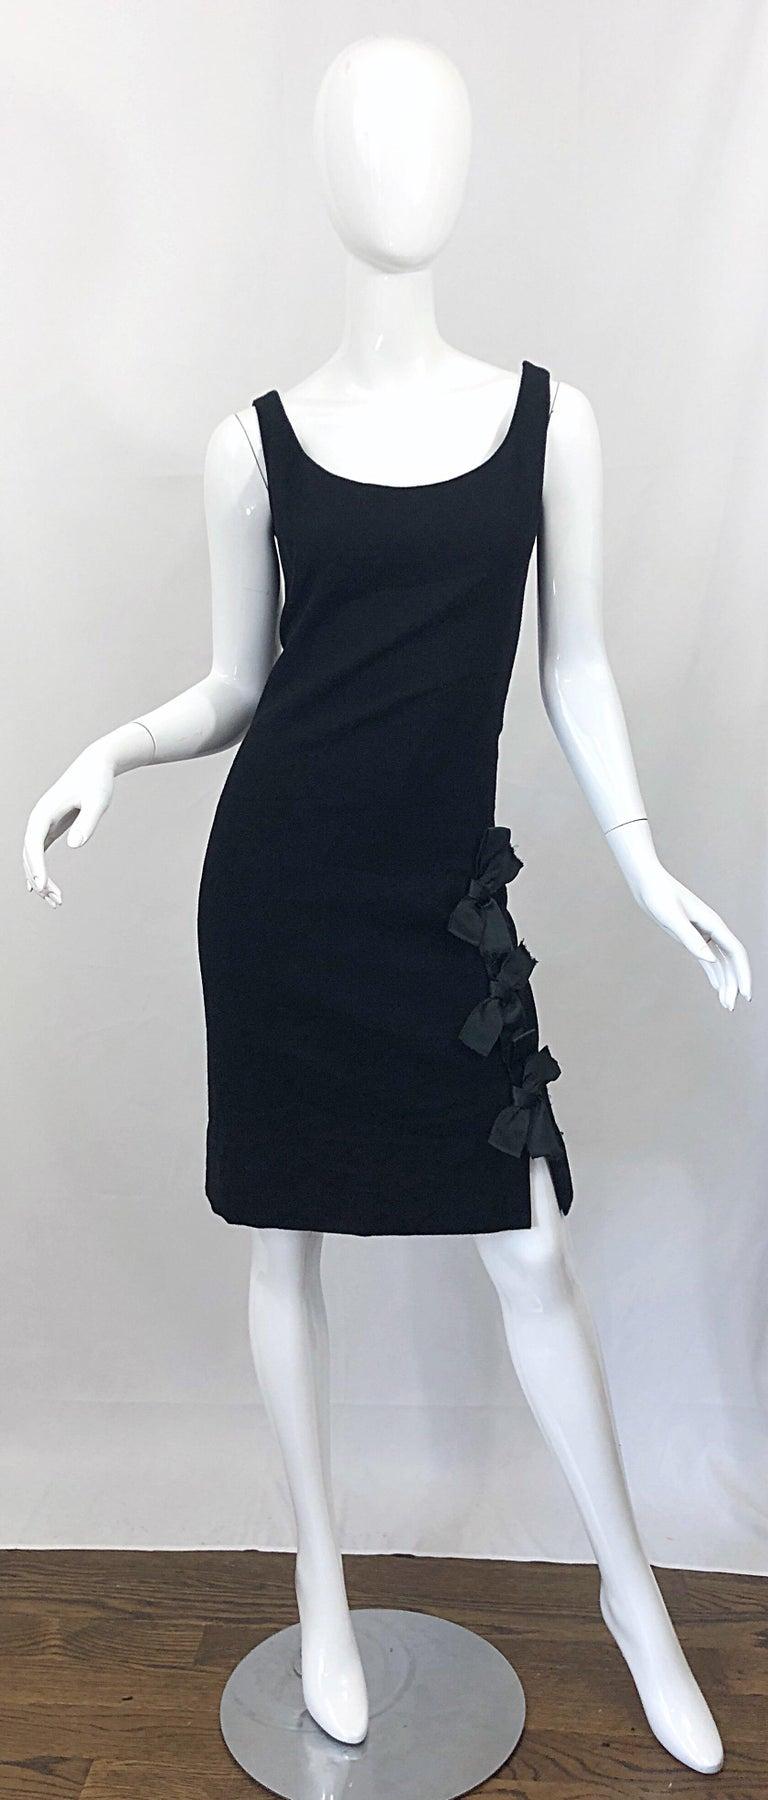 Geoffrey Beene 1960s Black Sleeveless Bow Detail Vintage 60s Wool Sheath Dress For Sale 10